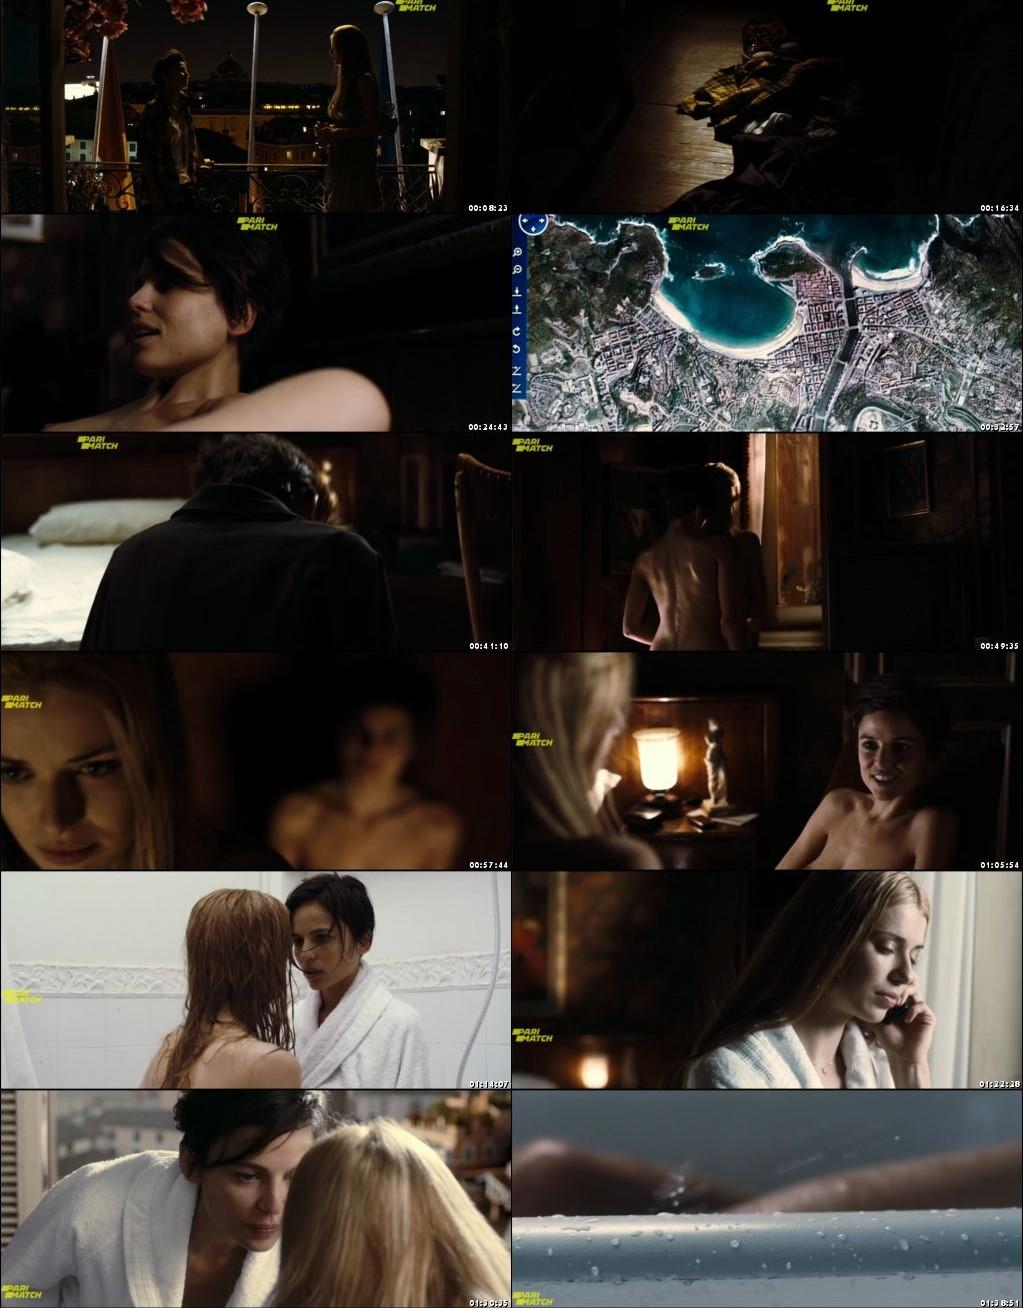 Room In Rome 2010 Full Movie Download BRRip 720p Dual Audio In Hindi Spanish